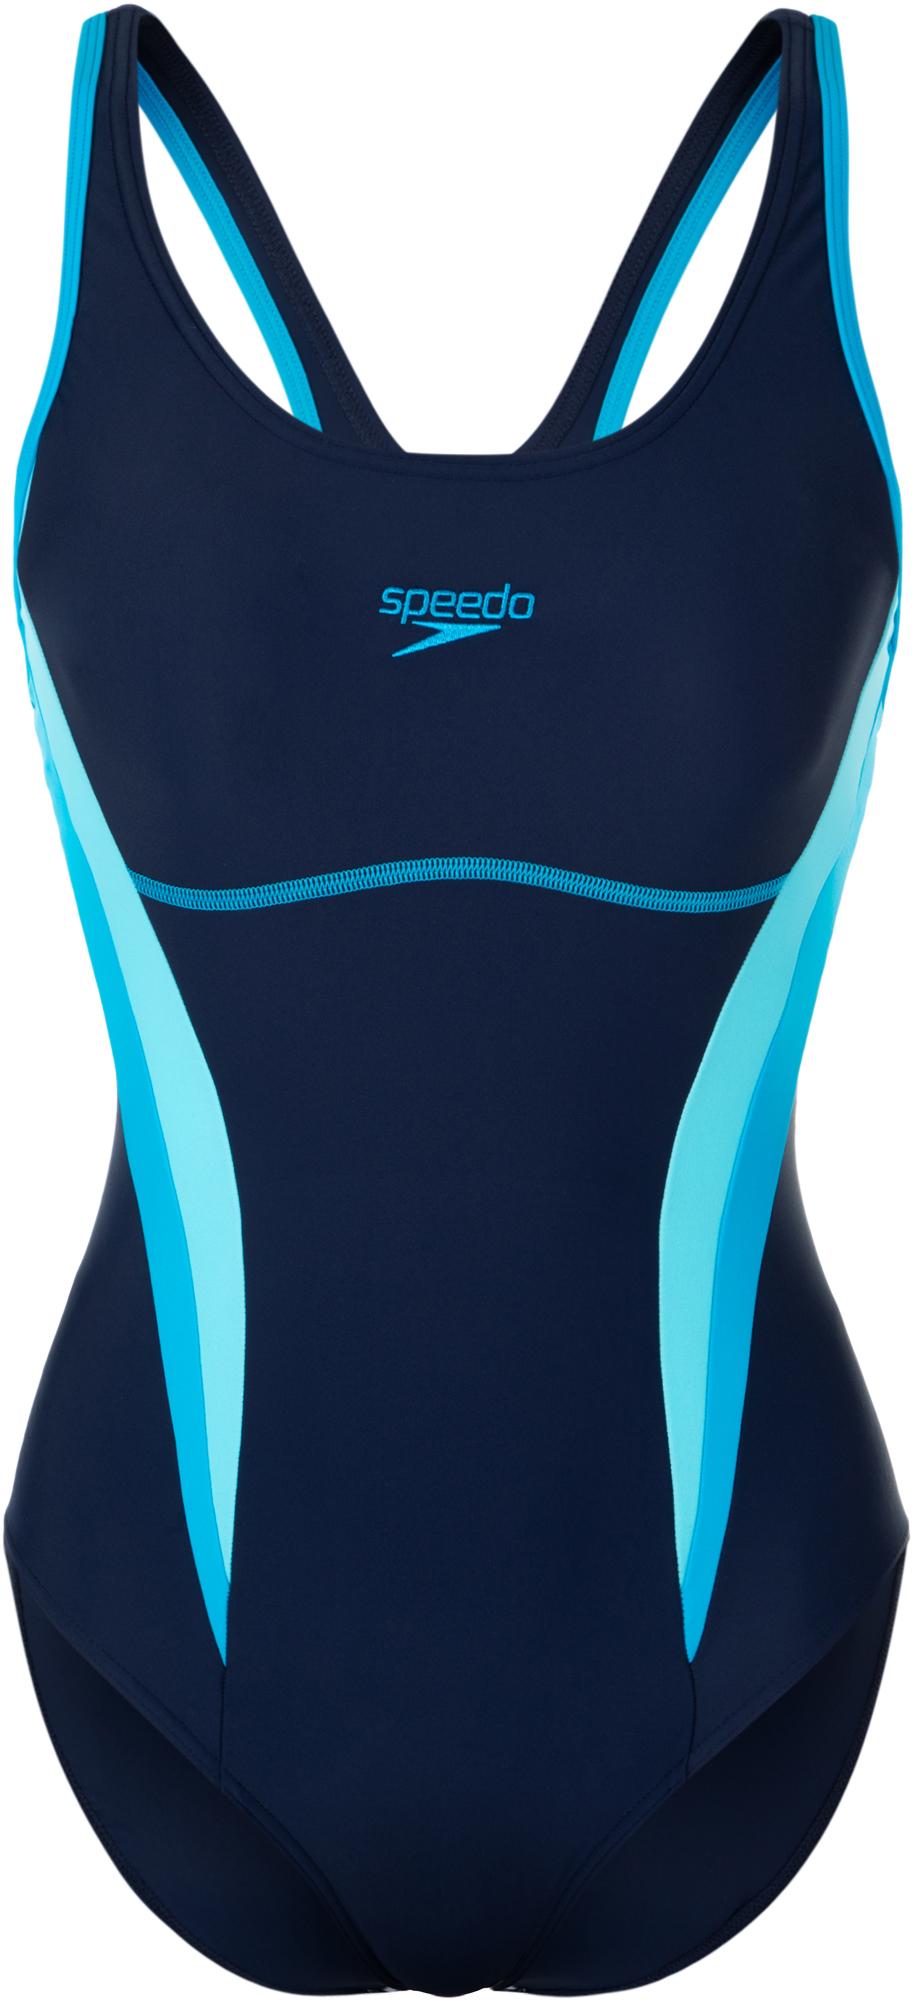 Speedo Купальник женский Sport Splice Muscleback (A), размер 52-54